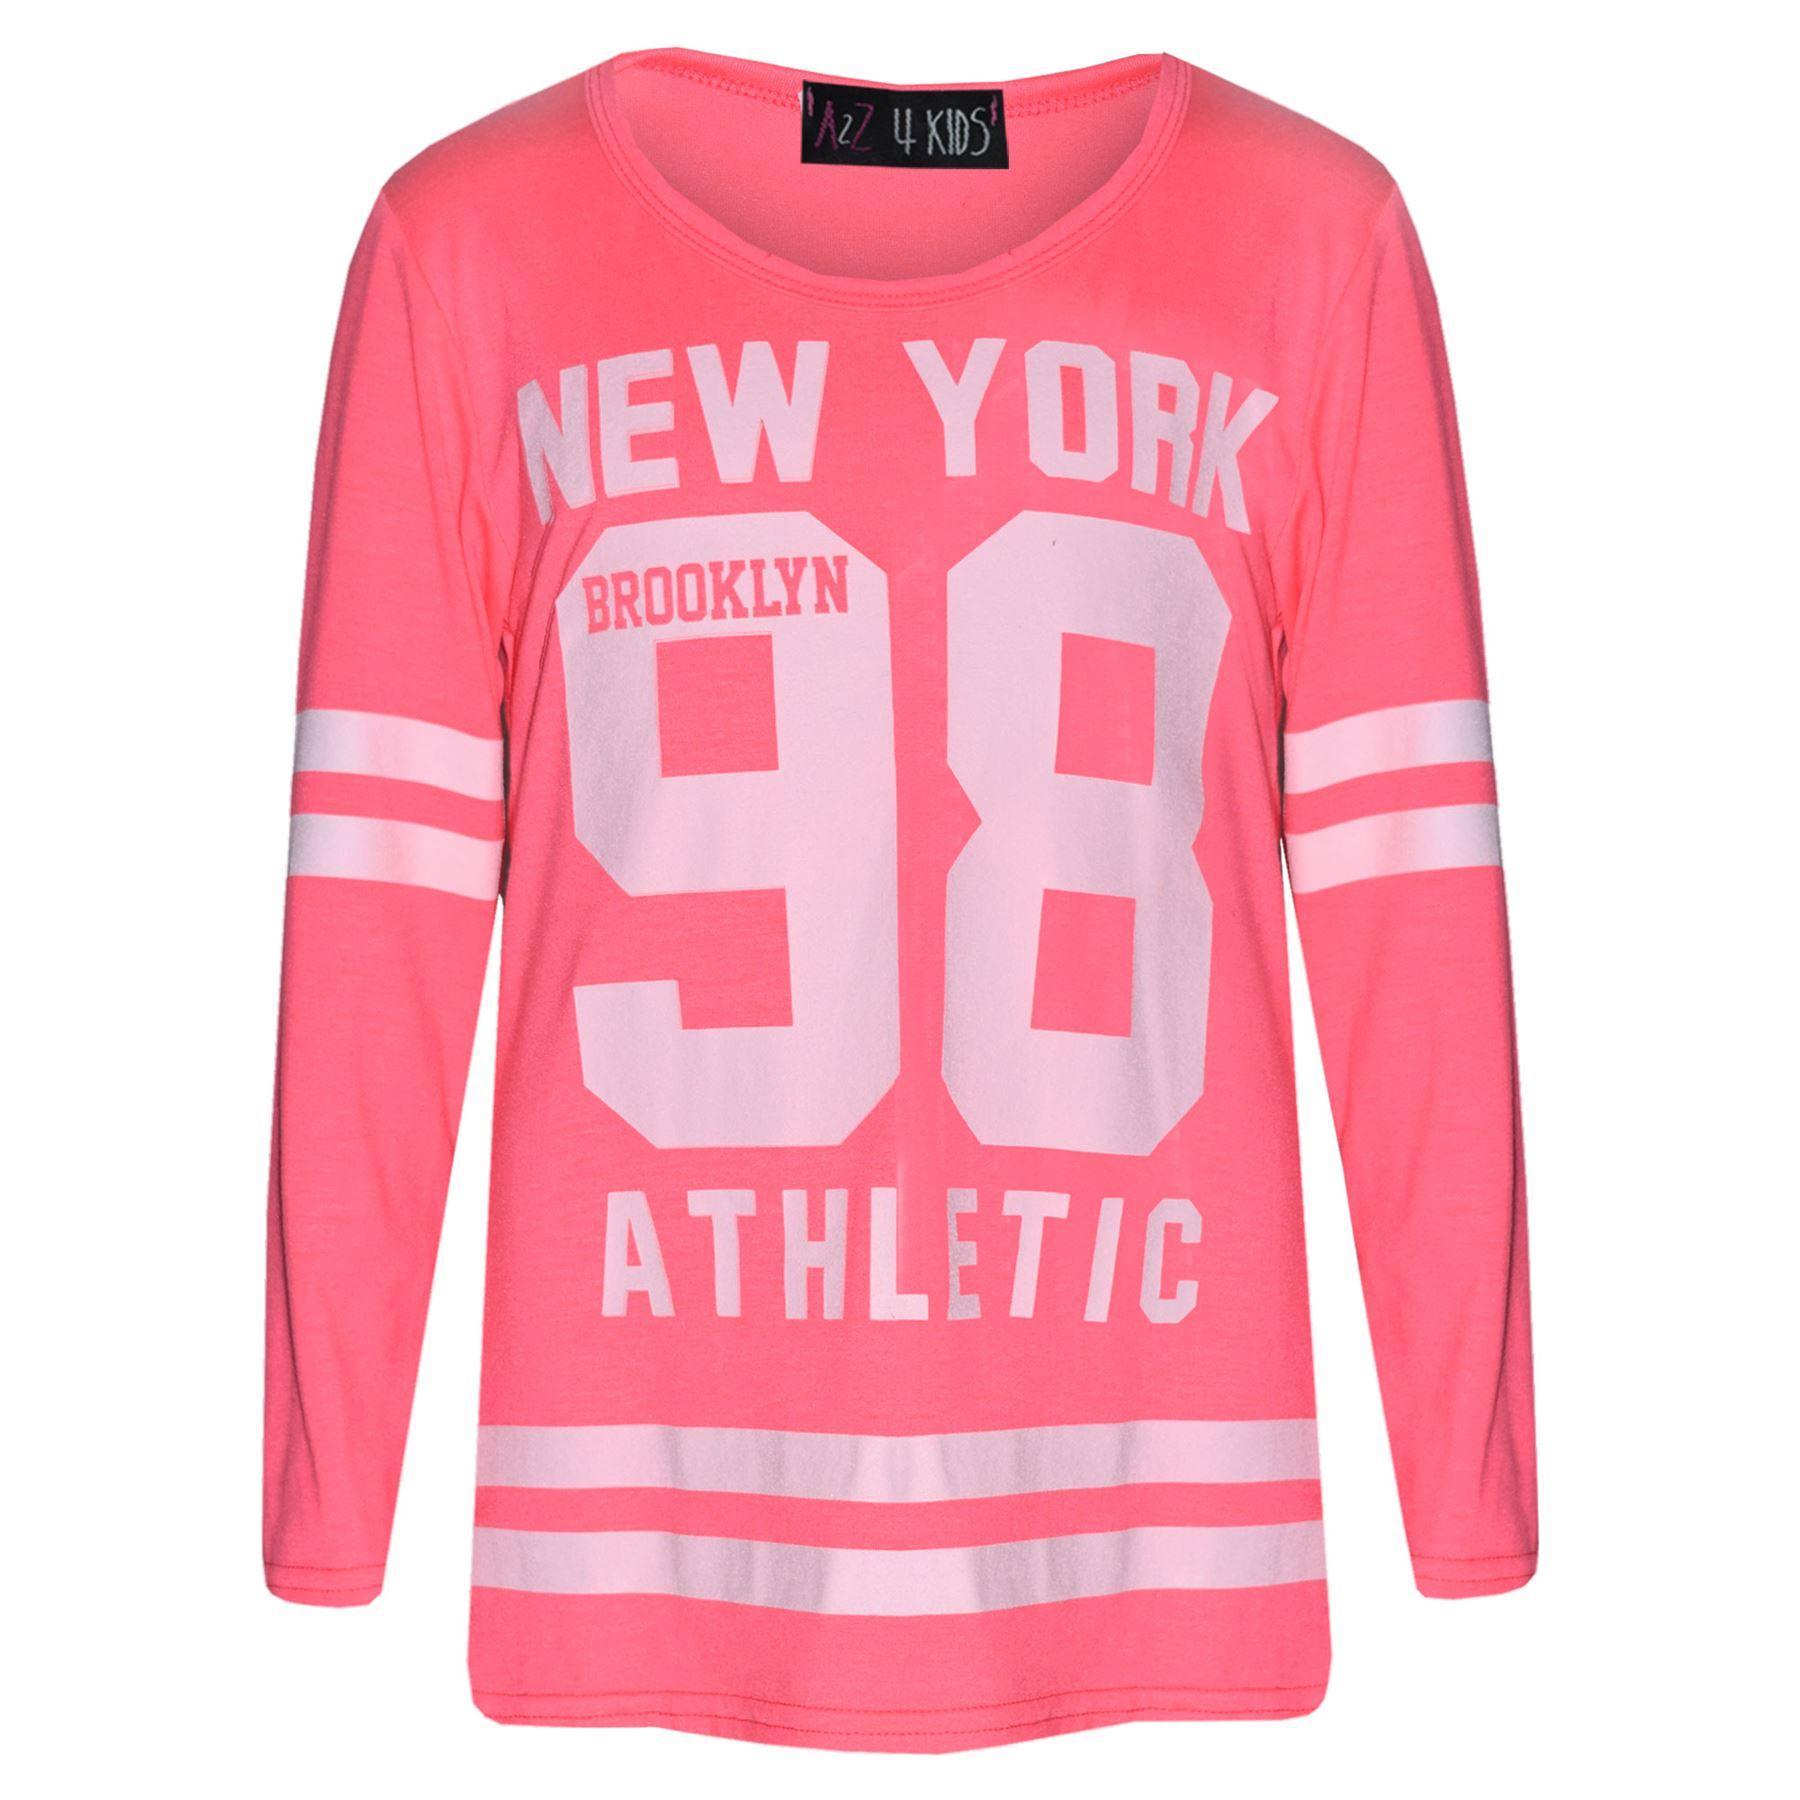 Girls-NEW-YORK-BROOKLYN-98-ATHLECTIC-Camouflage-Print-Top-amp-Legging-Set-7-13-Yr thumbnail 65